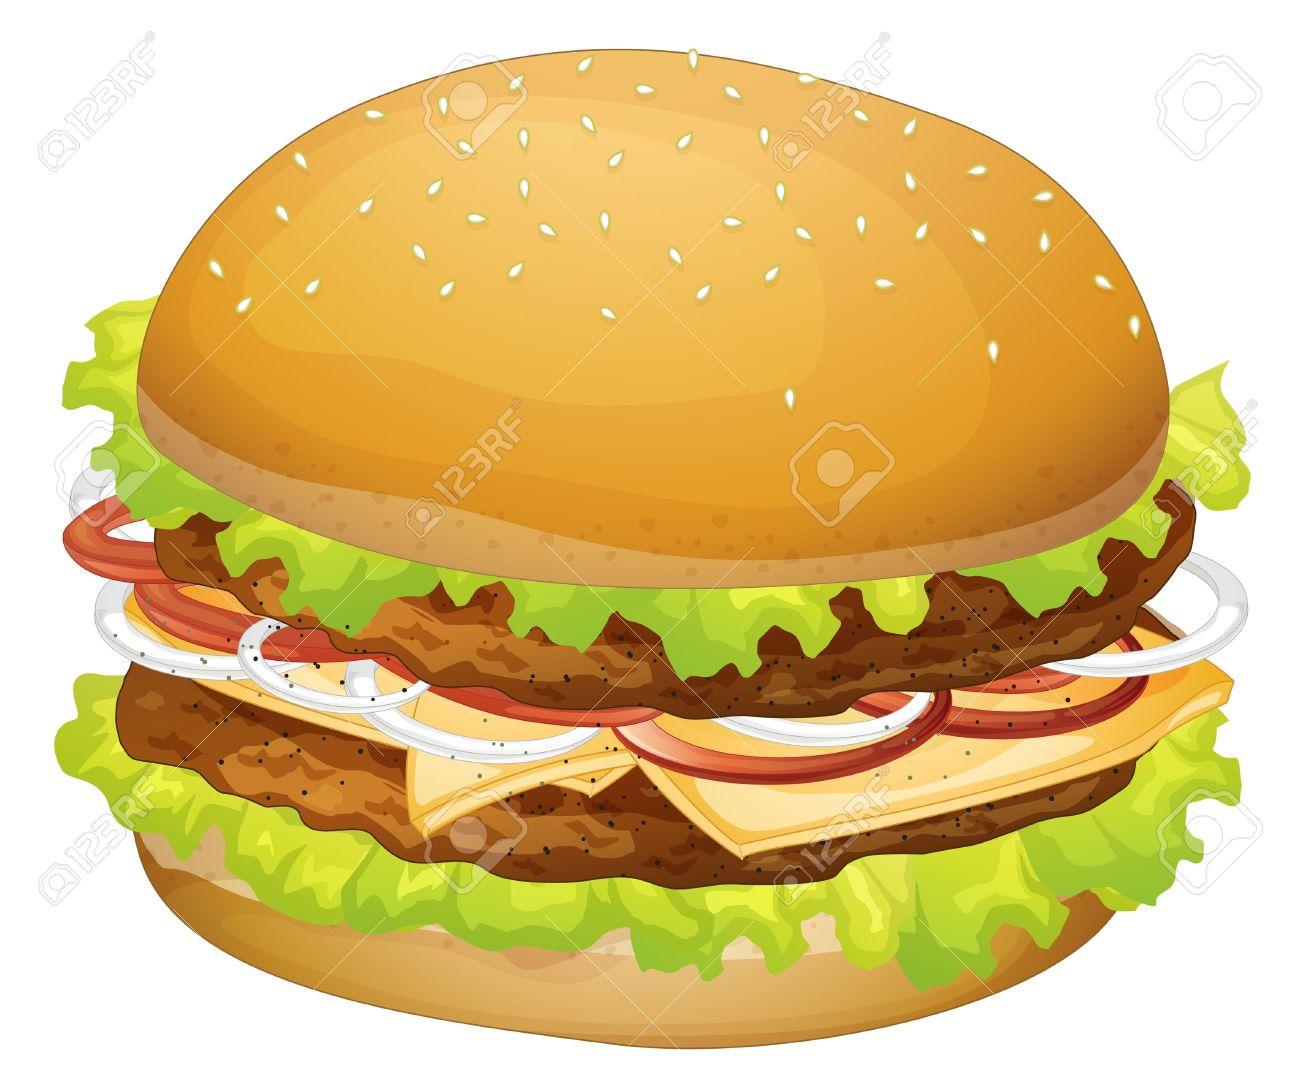 Hamburger clipart transparent background Clipart Cheeseburger Art hamburger Hamburger